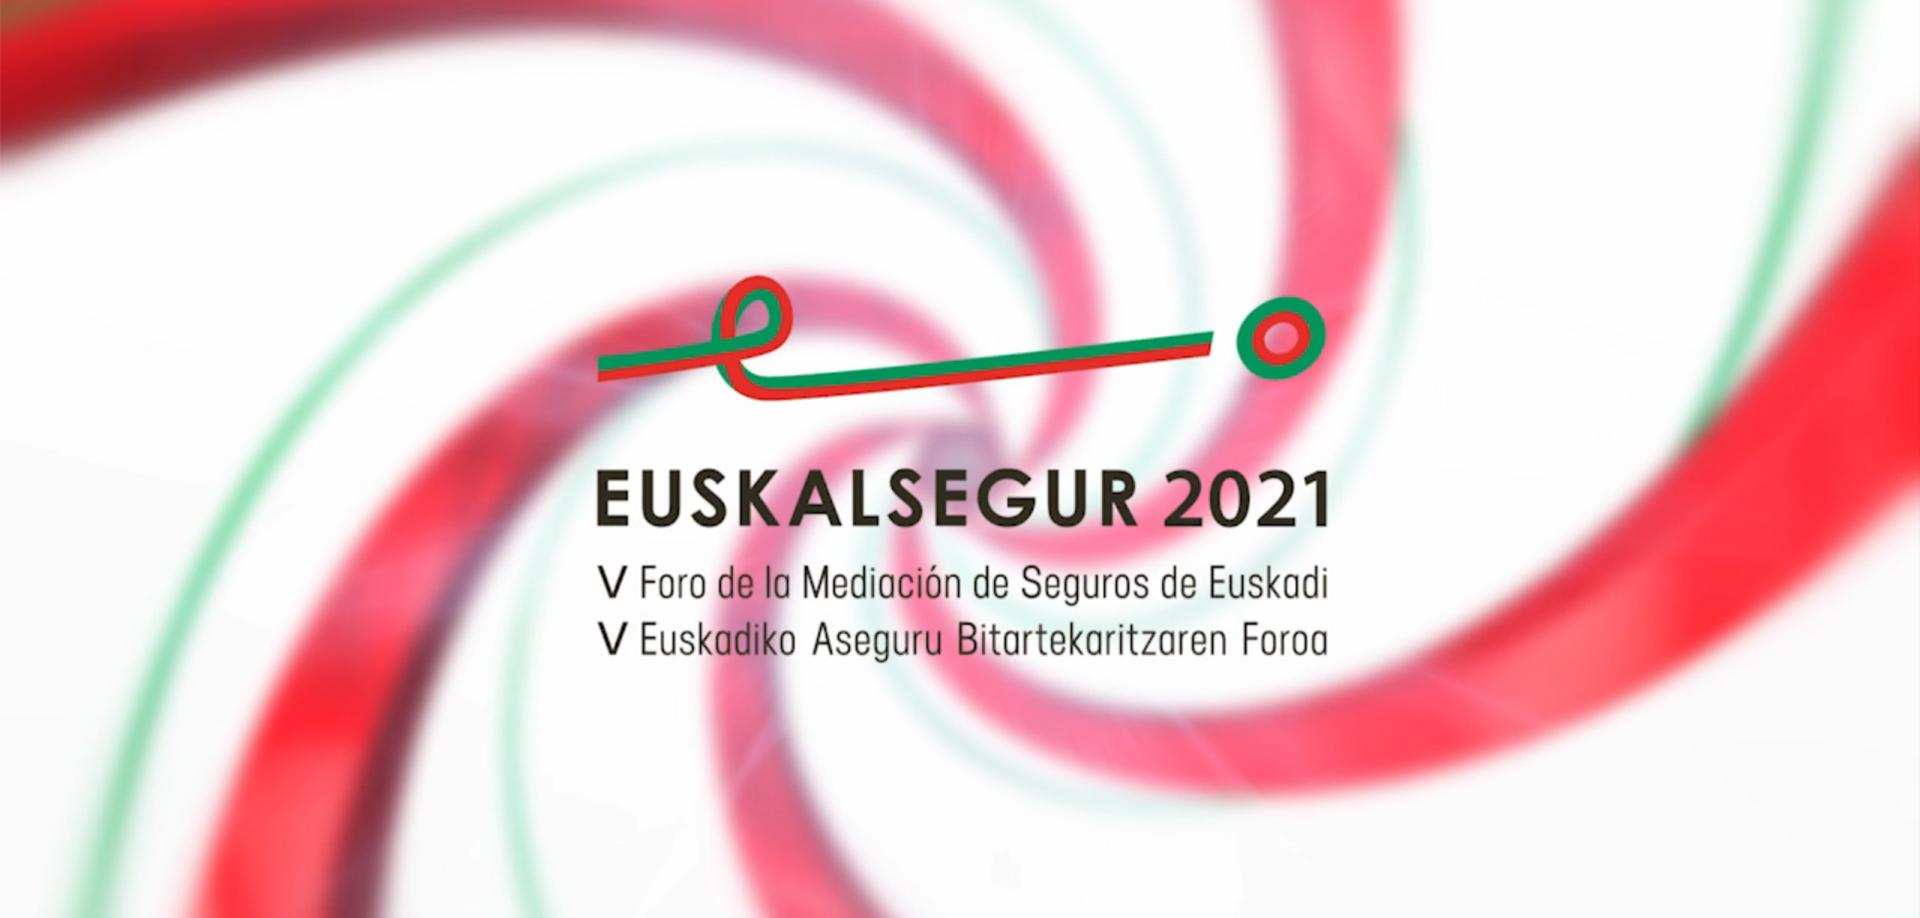 Euskalsegur 2021